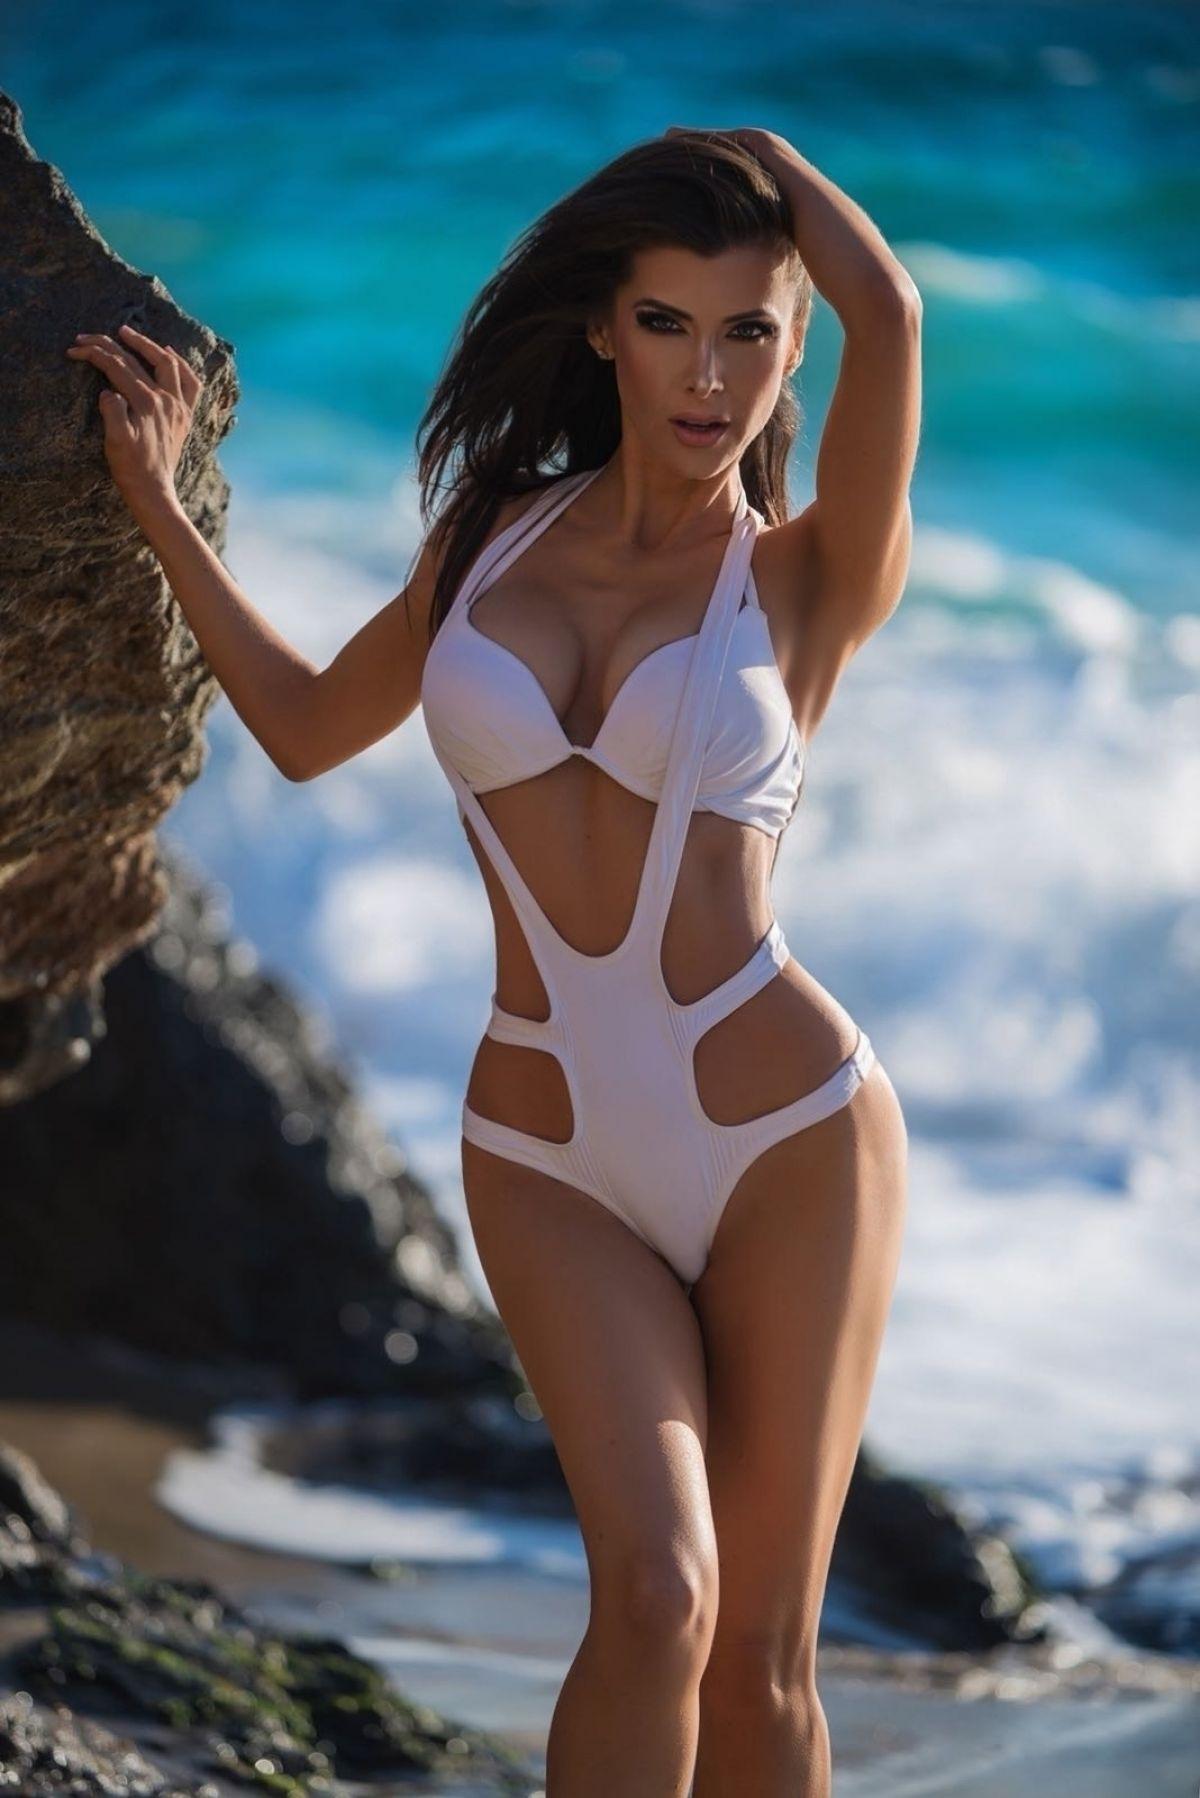 Sideboobs Bikini Ildiko Ferenczi naked photo 2017